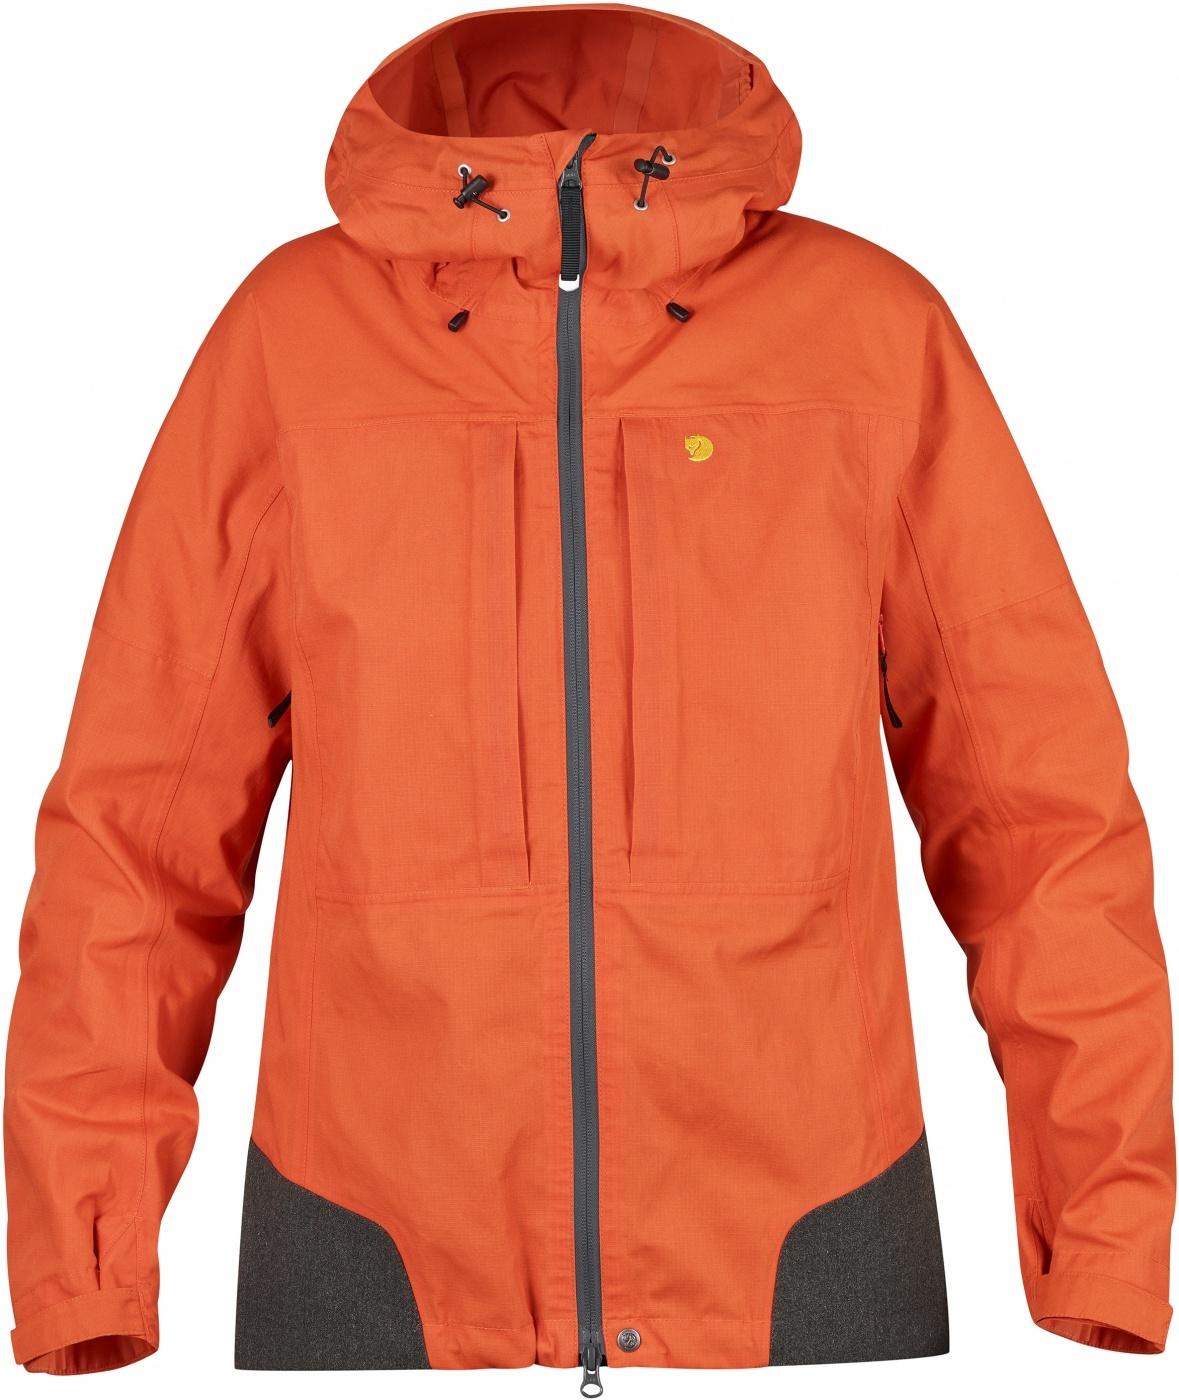 FjallRaven Bergtagen Jacket W Hokkaido Orange-30